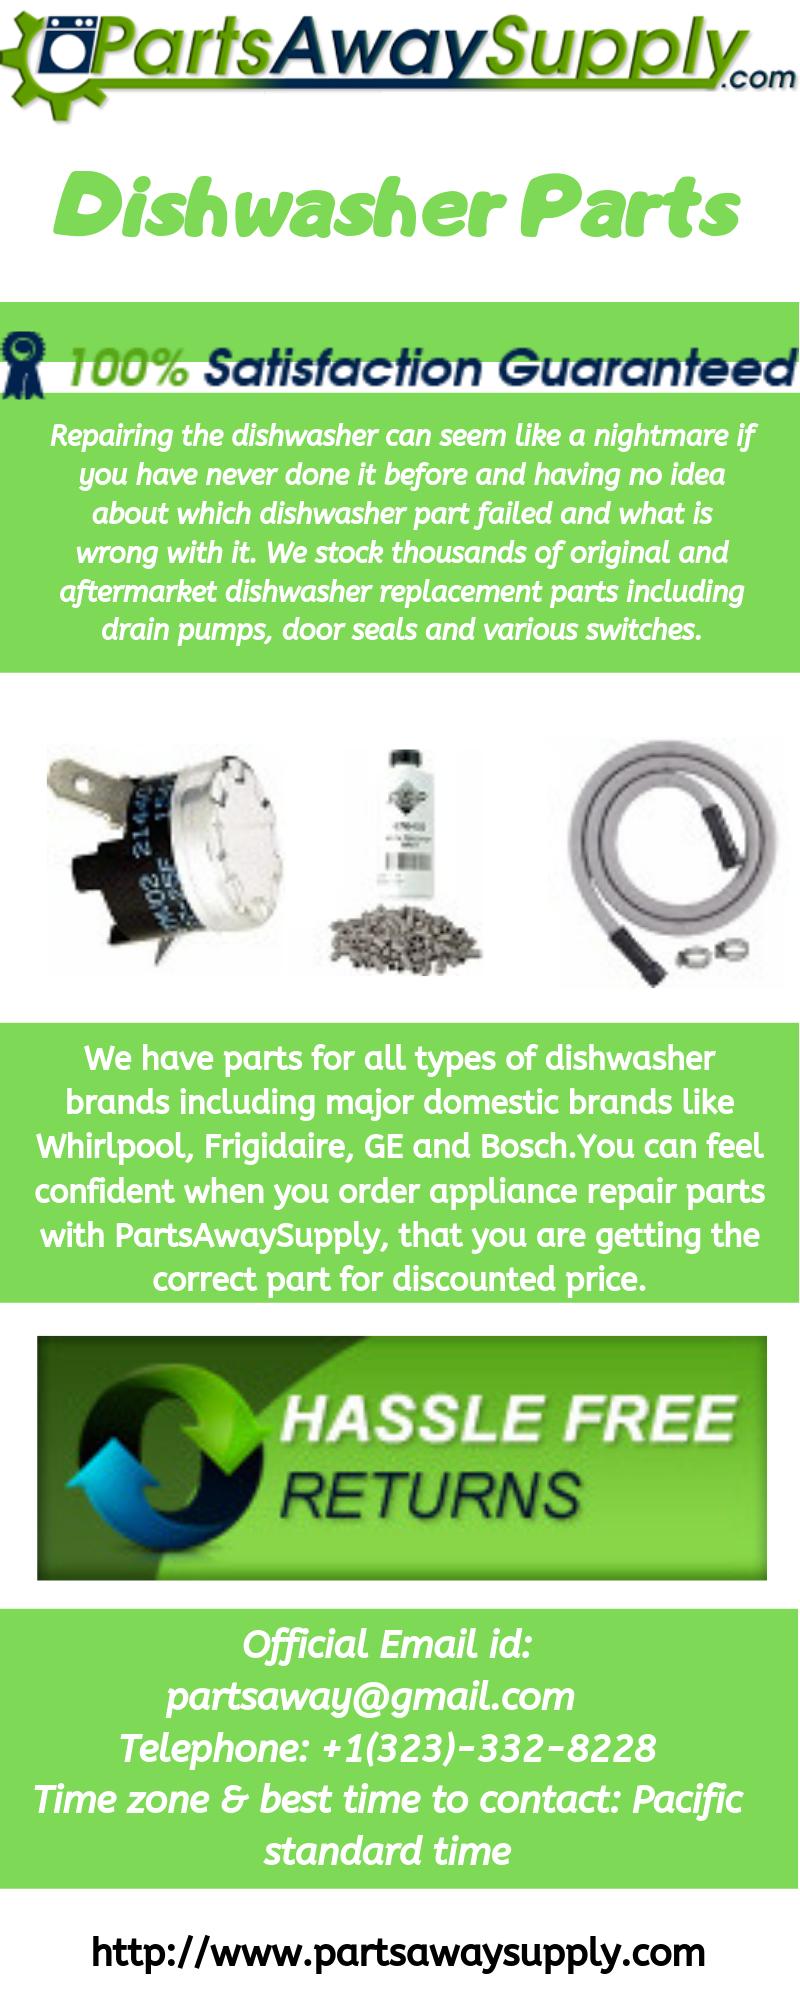 Best Range Of Dishwasher Parts At Home Appliance Parts Seller We